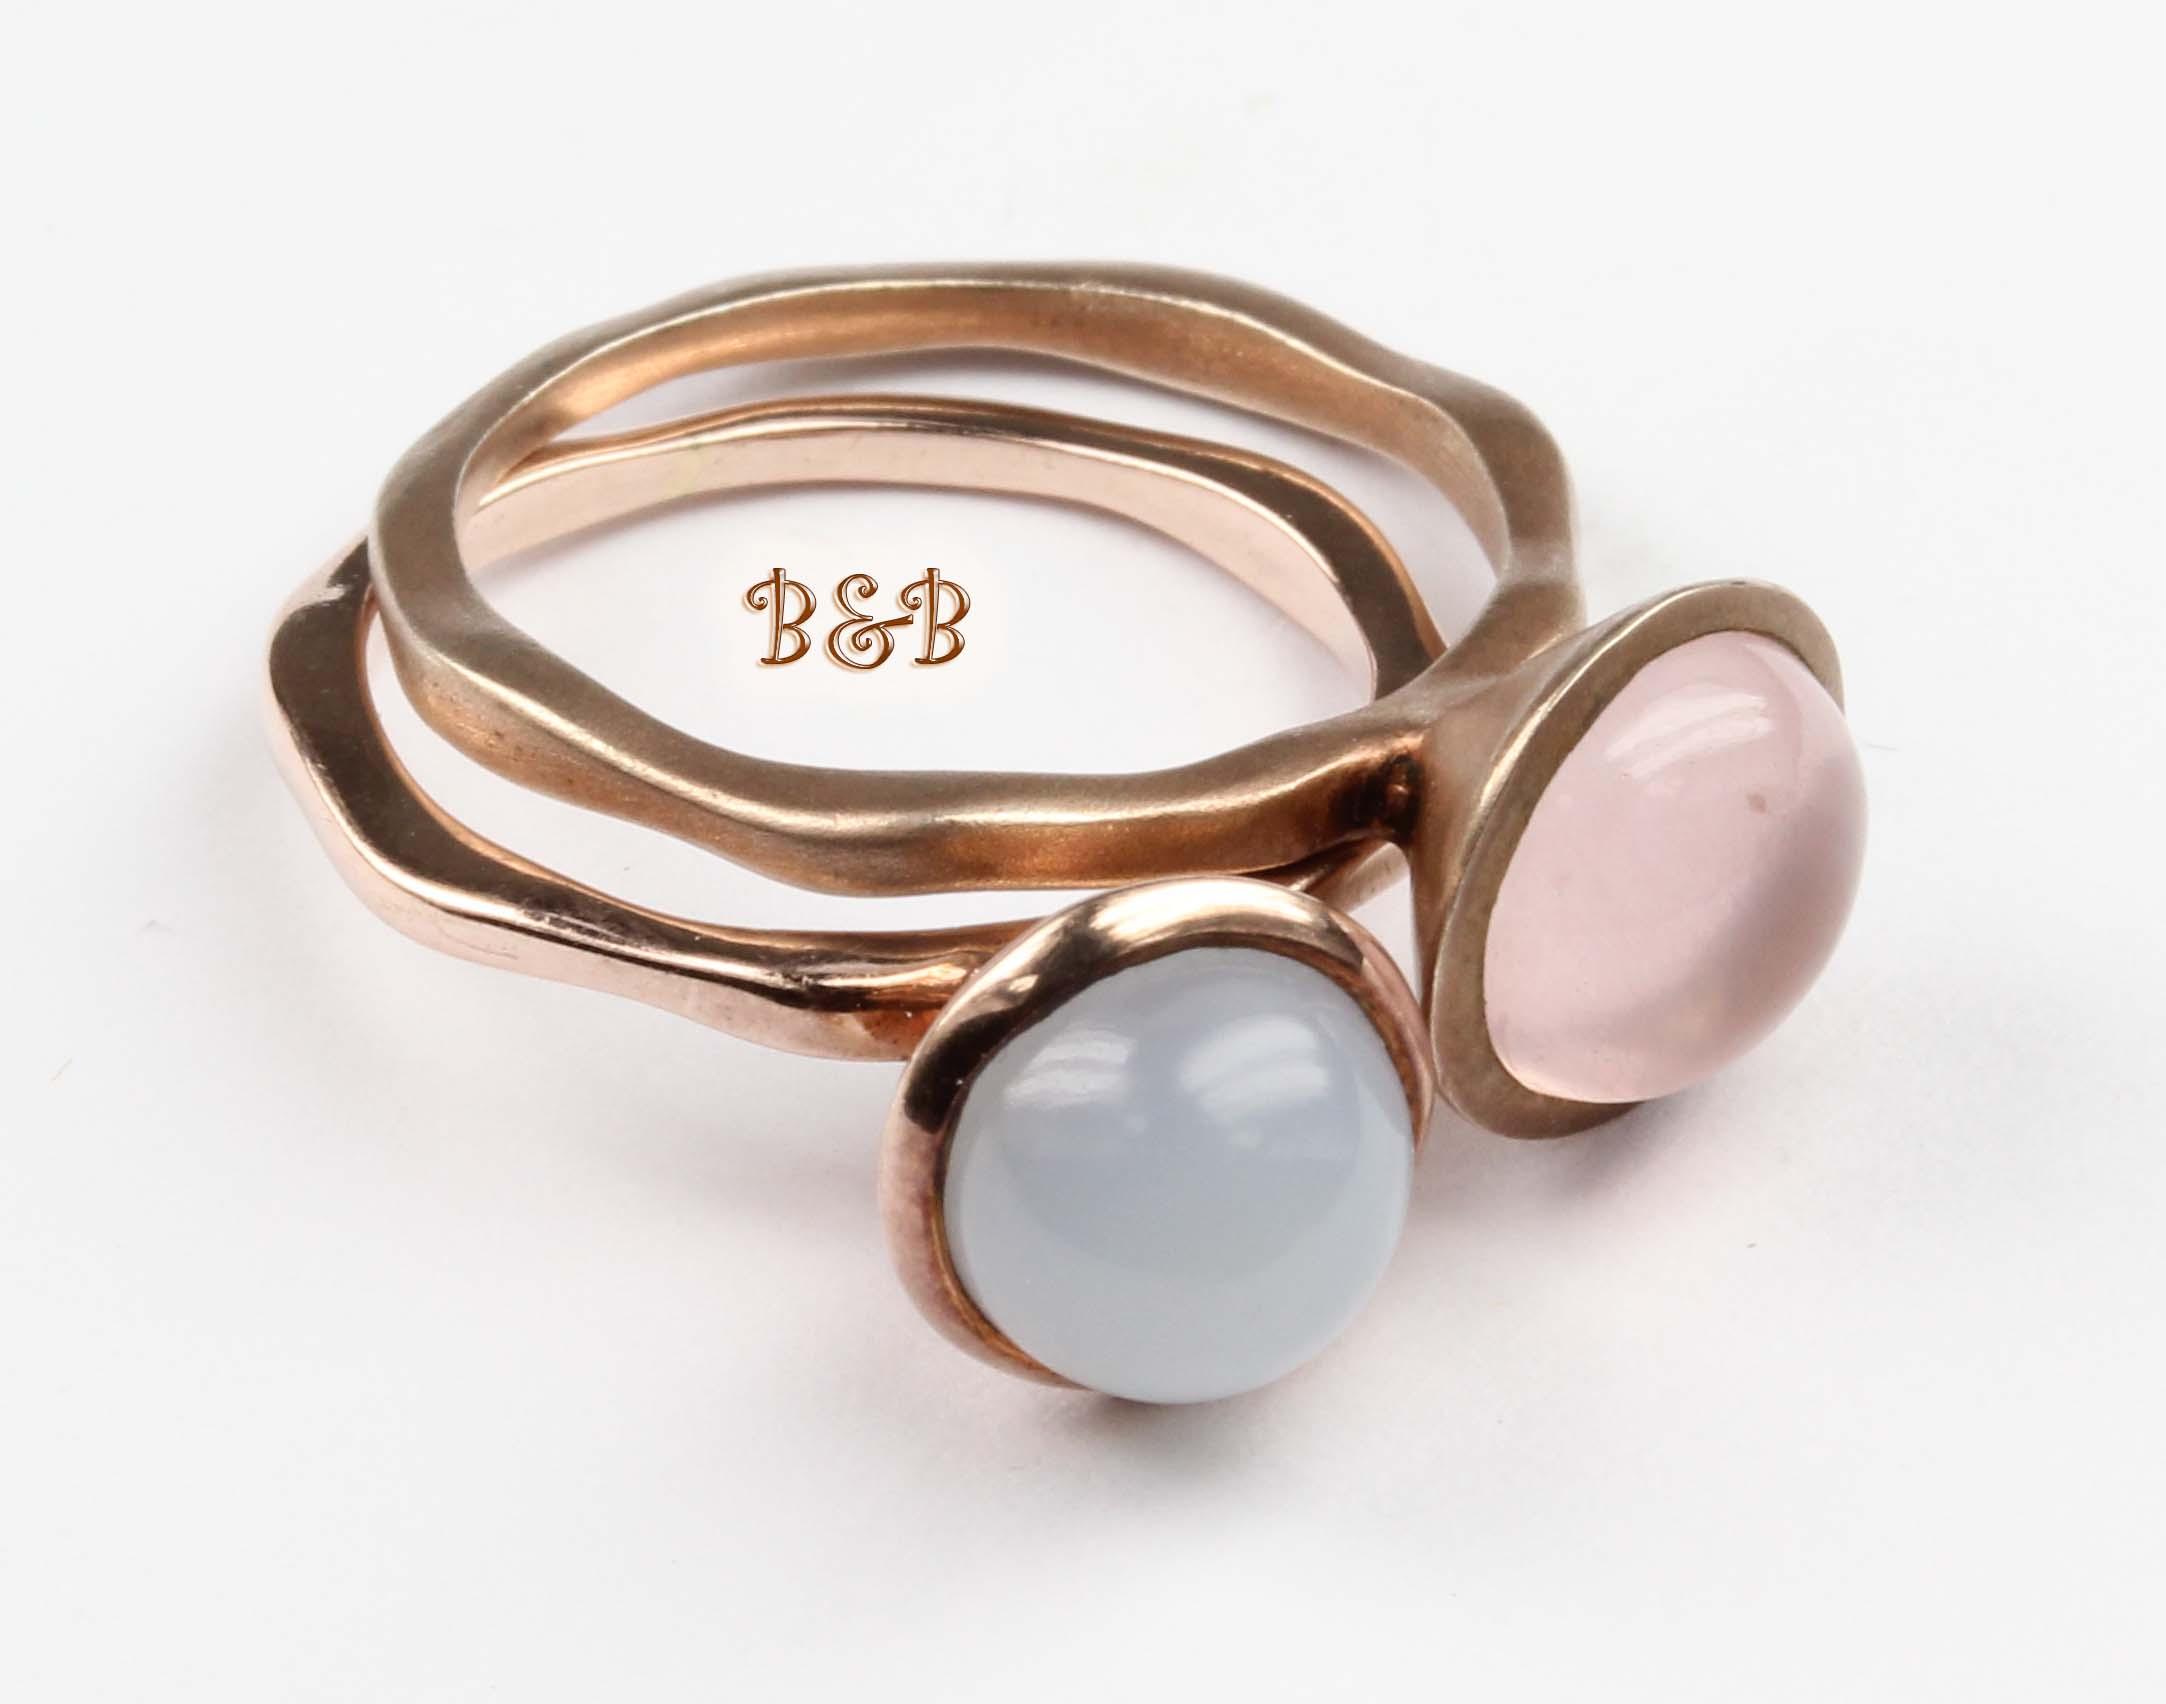 Silver ring_B&B_1589